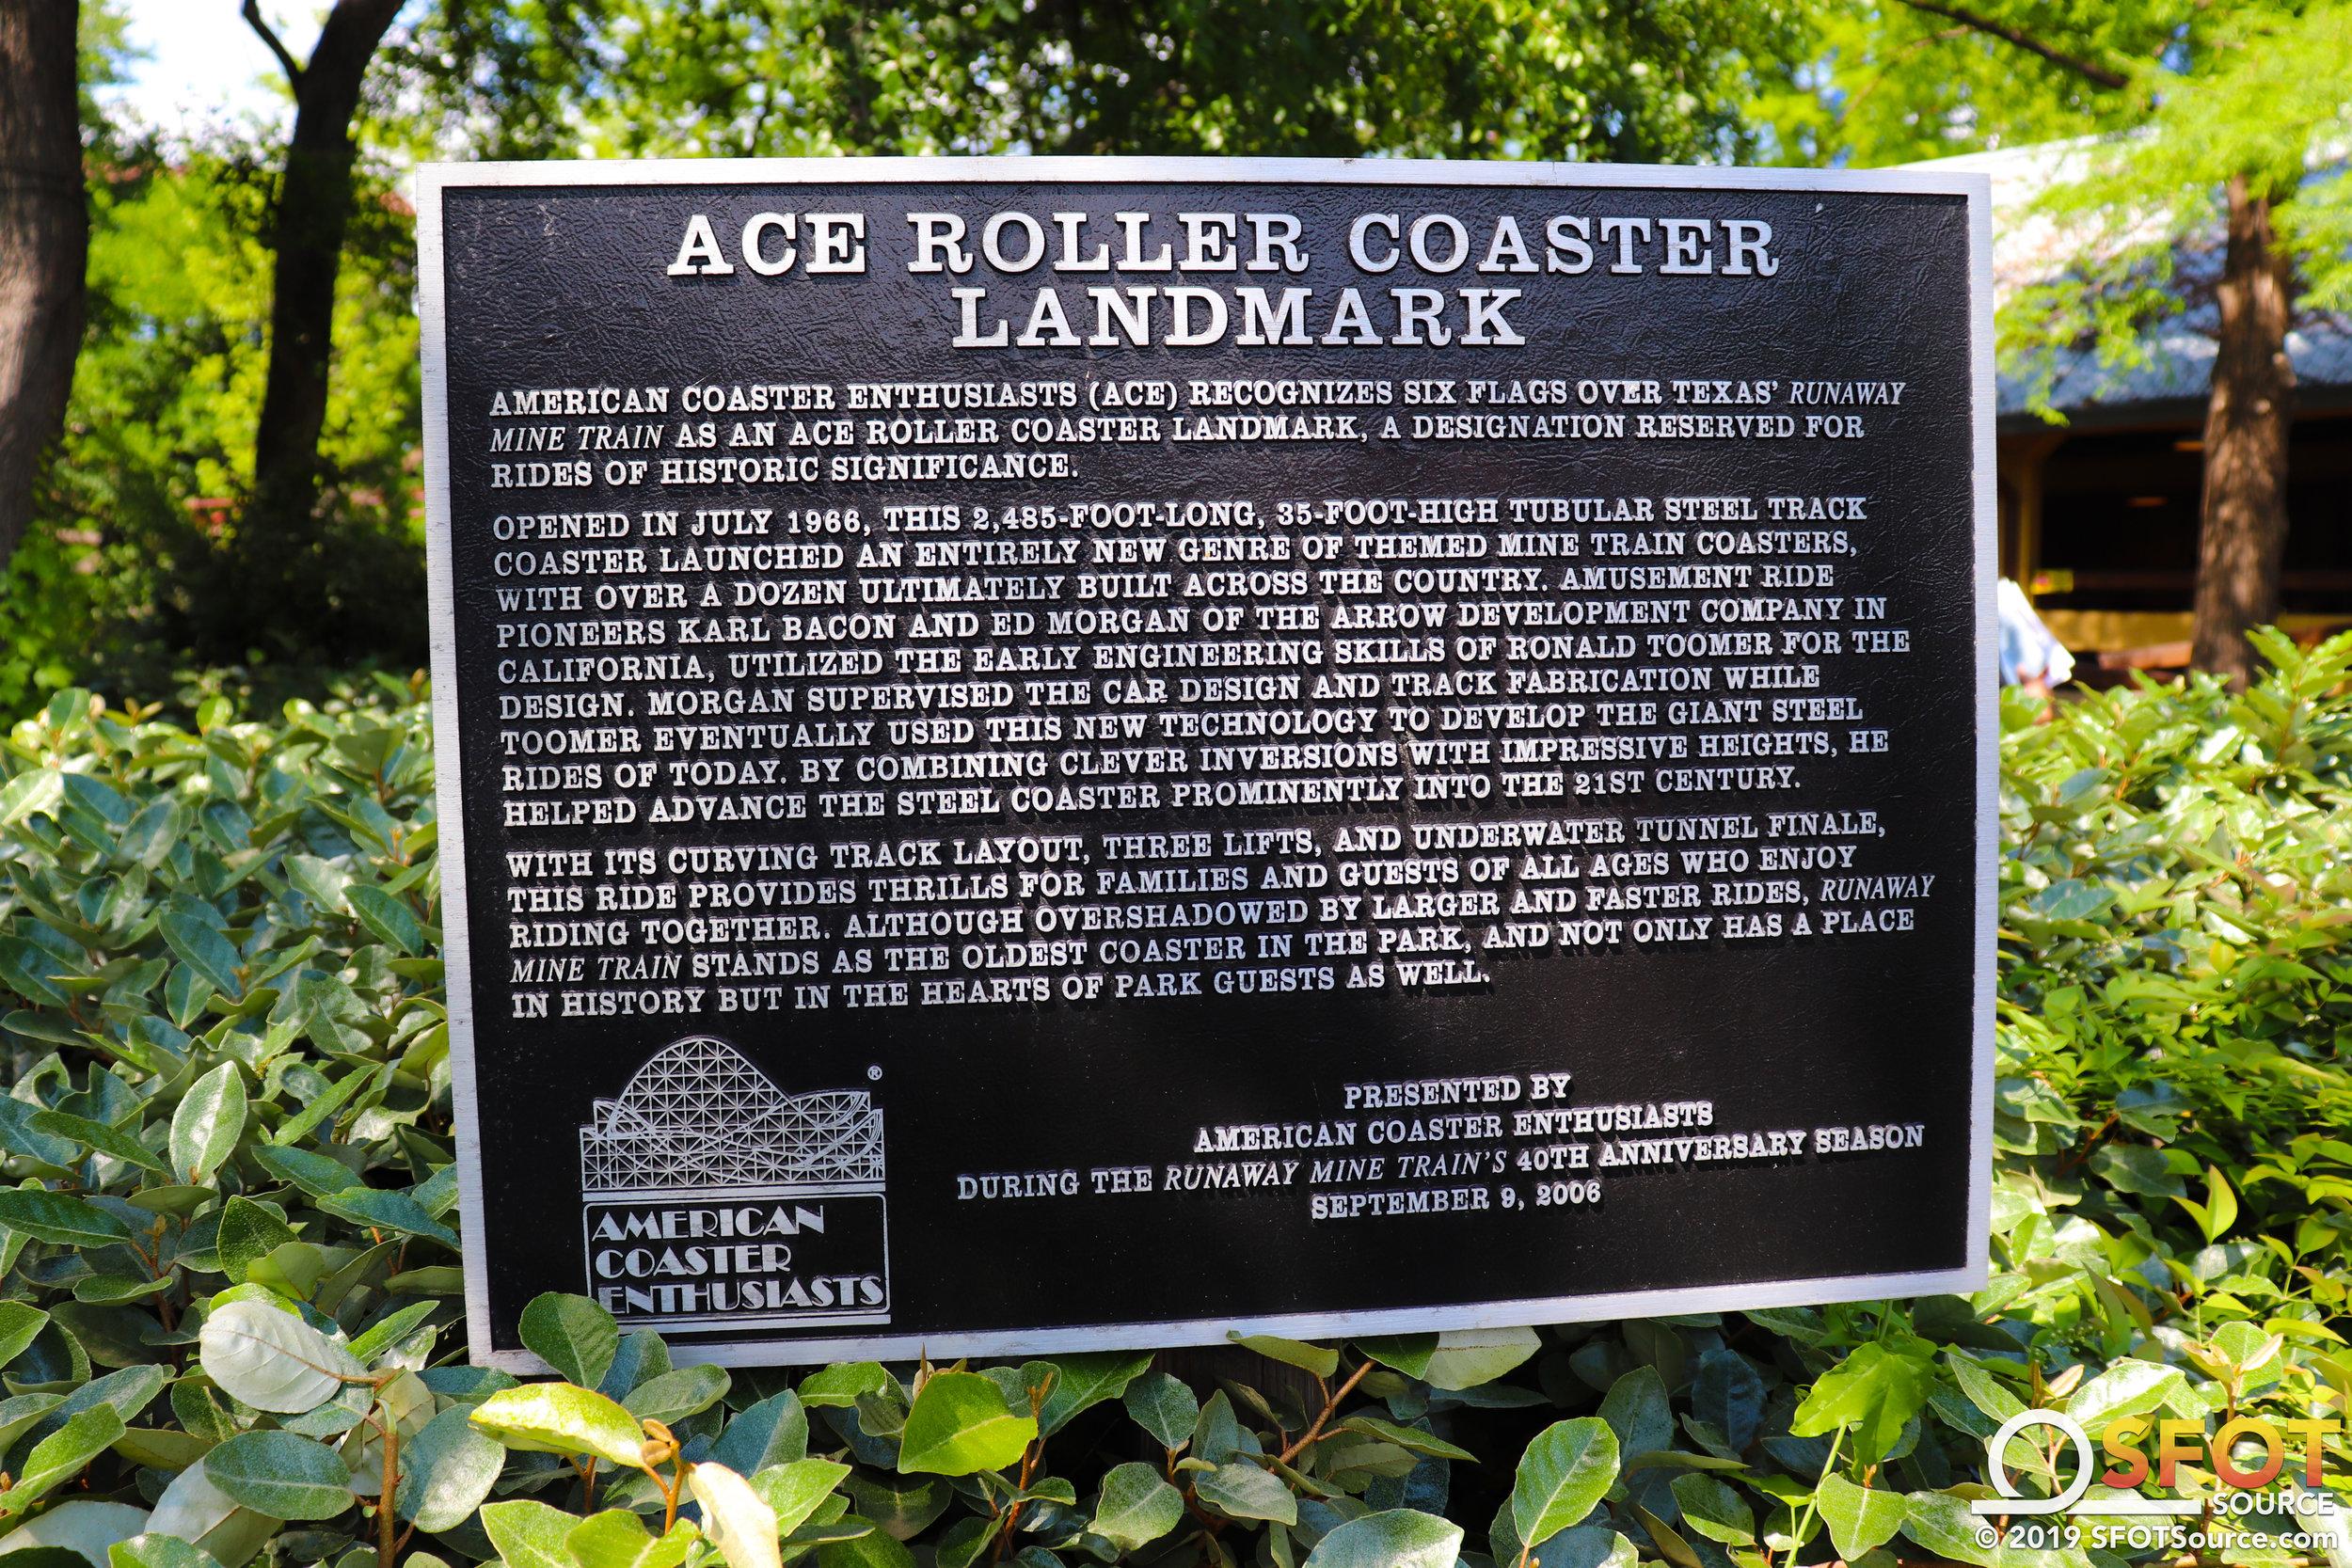 ACE designated Runaway Mine Train a Roller Coaster Landmark in 2006.